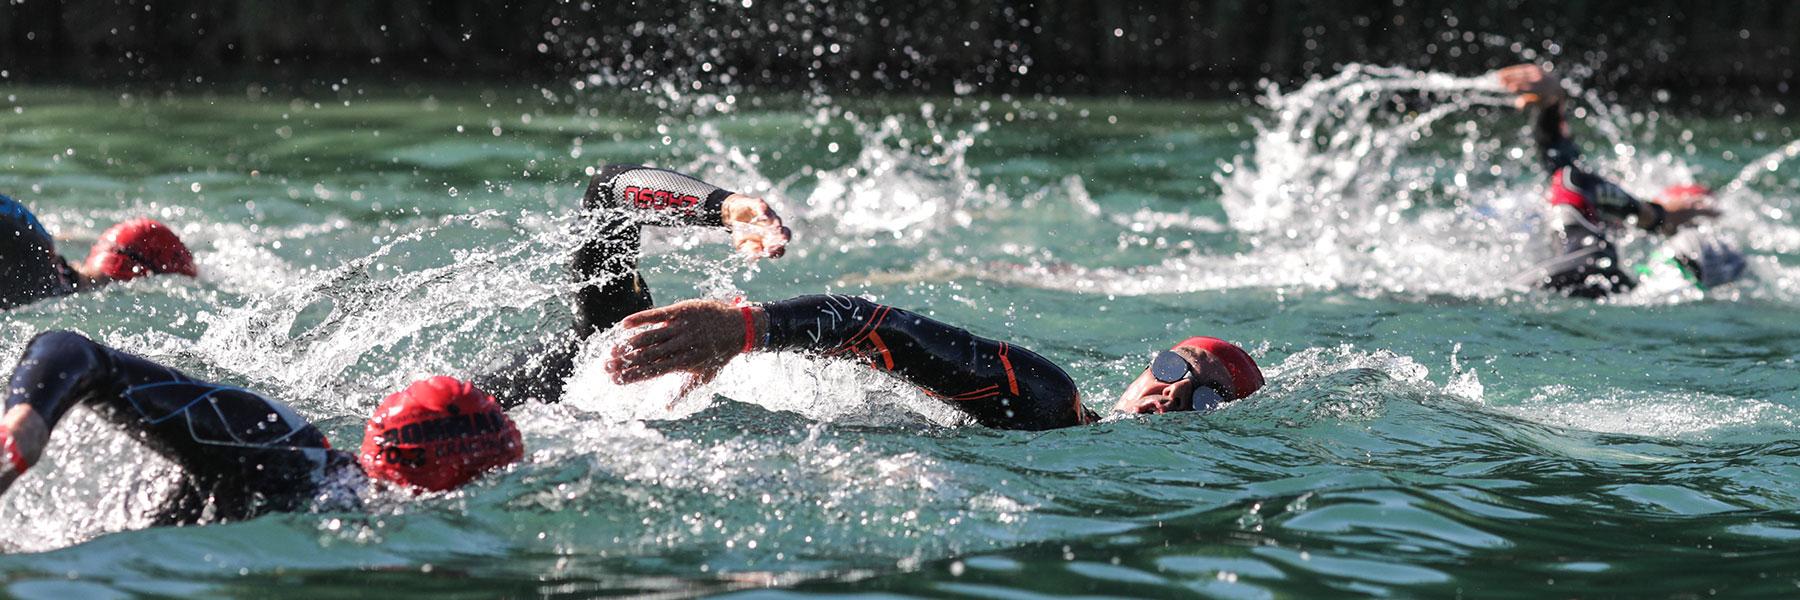 5150 Kraichgau athletes with red swim caps swimming in Hardtsee in Kraichgau